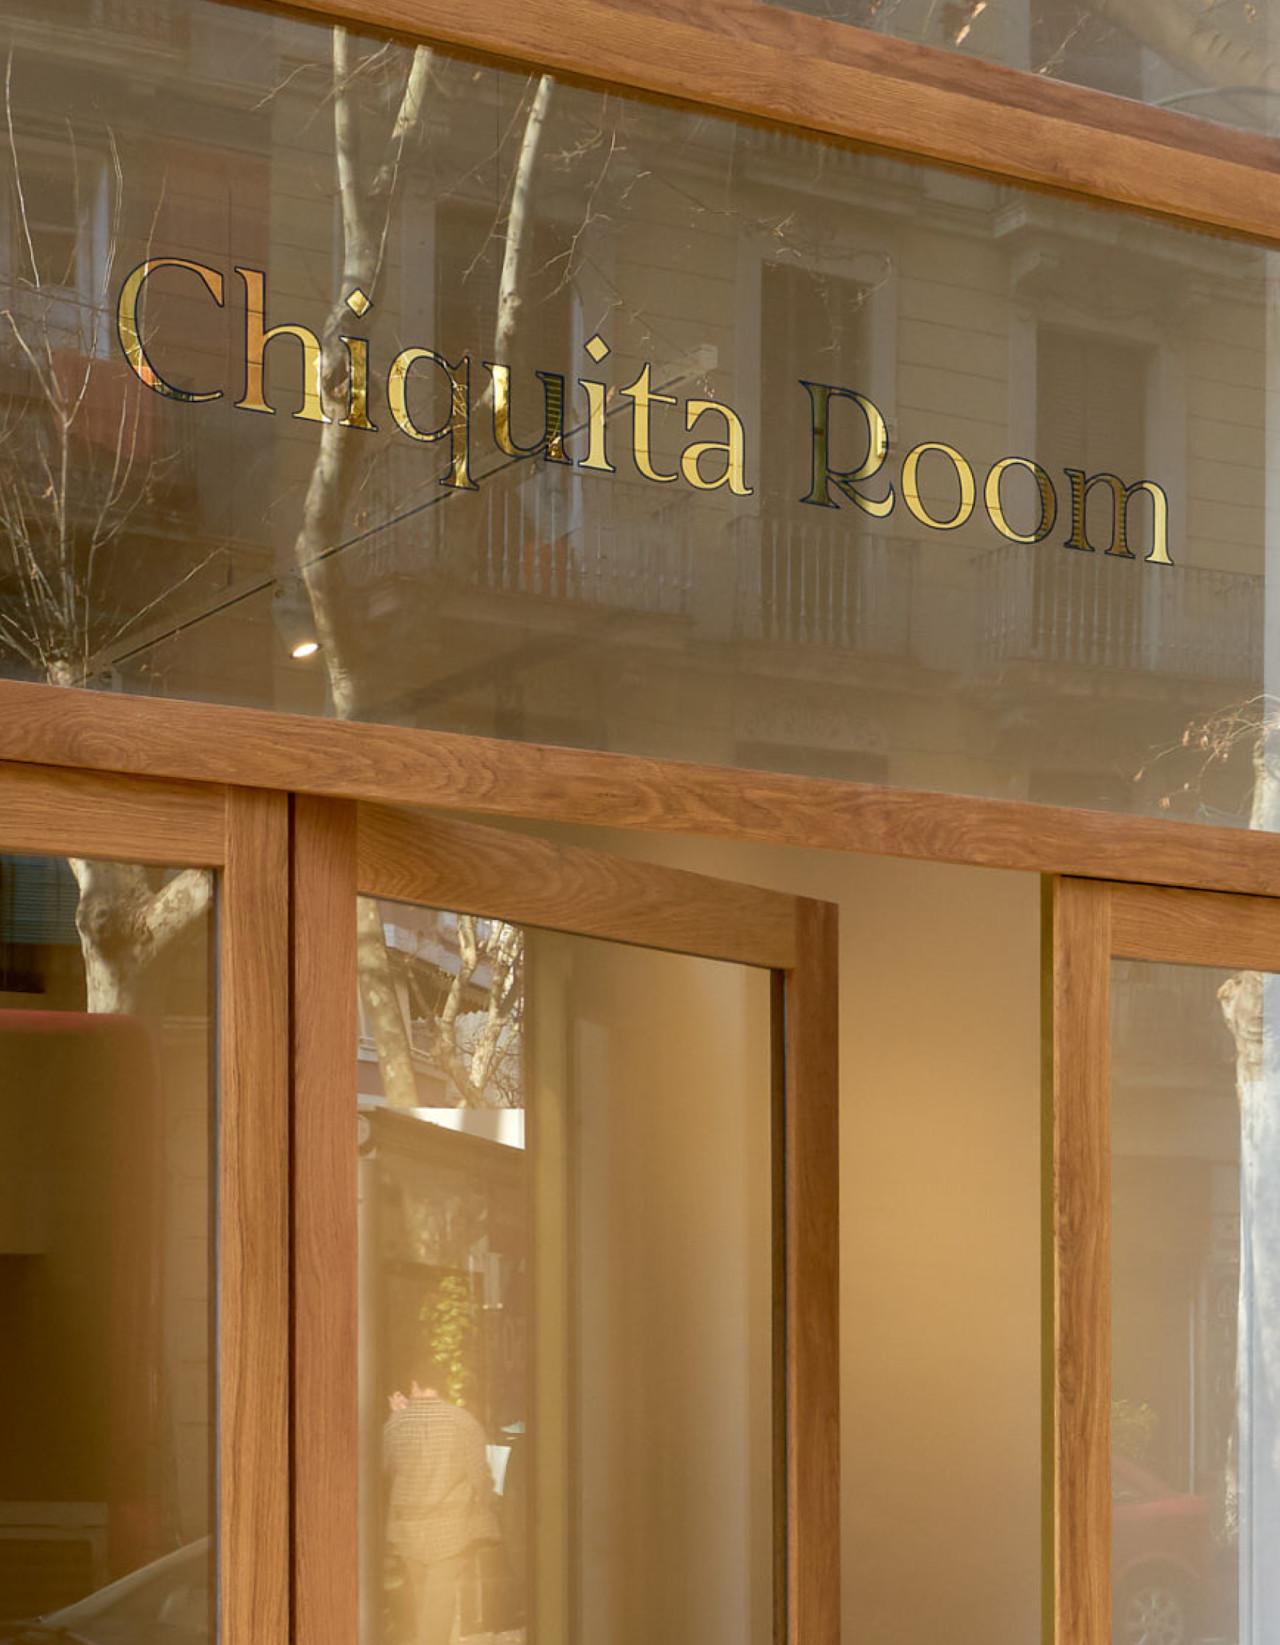 A. AMILL BOSCO IDENTITY FOR CHIQUITA ROOM